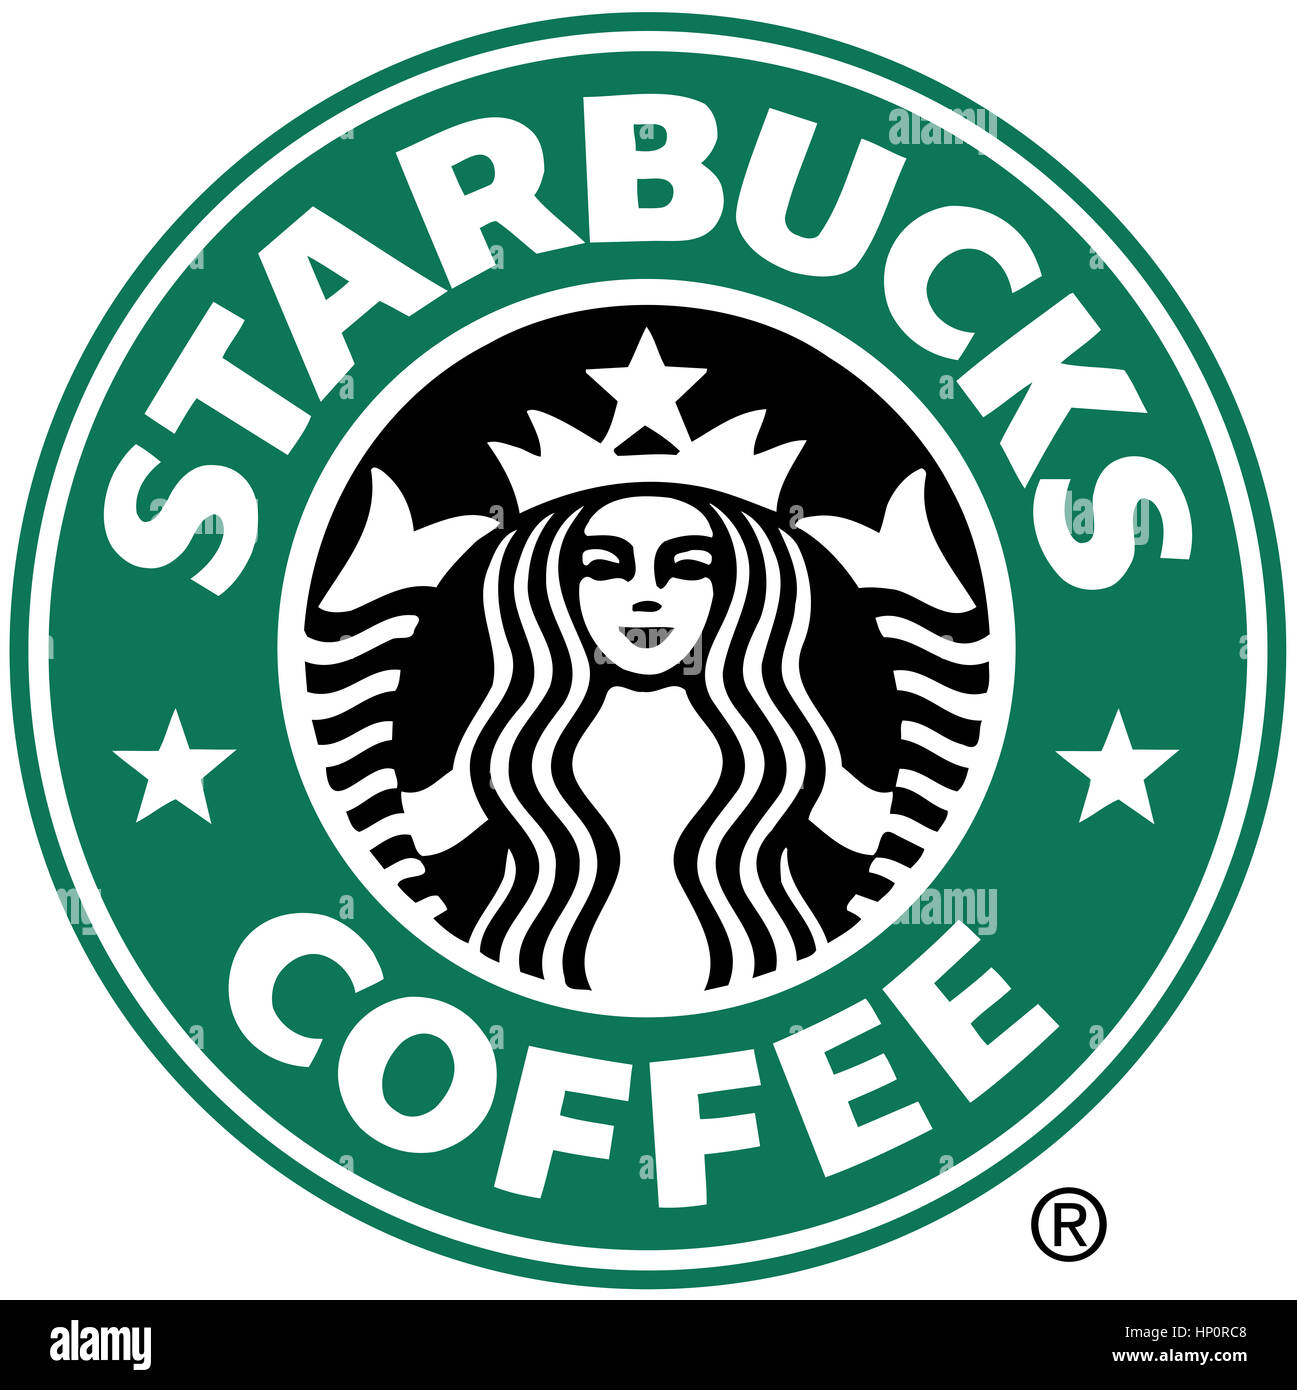 Starbucks logo stock photo 134013384 alamy starbucks logo biocorpaavc Image collections